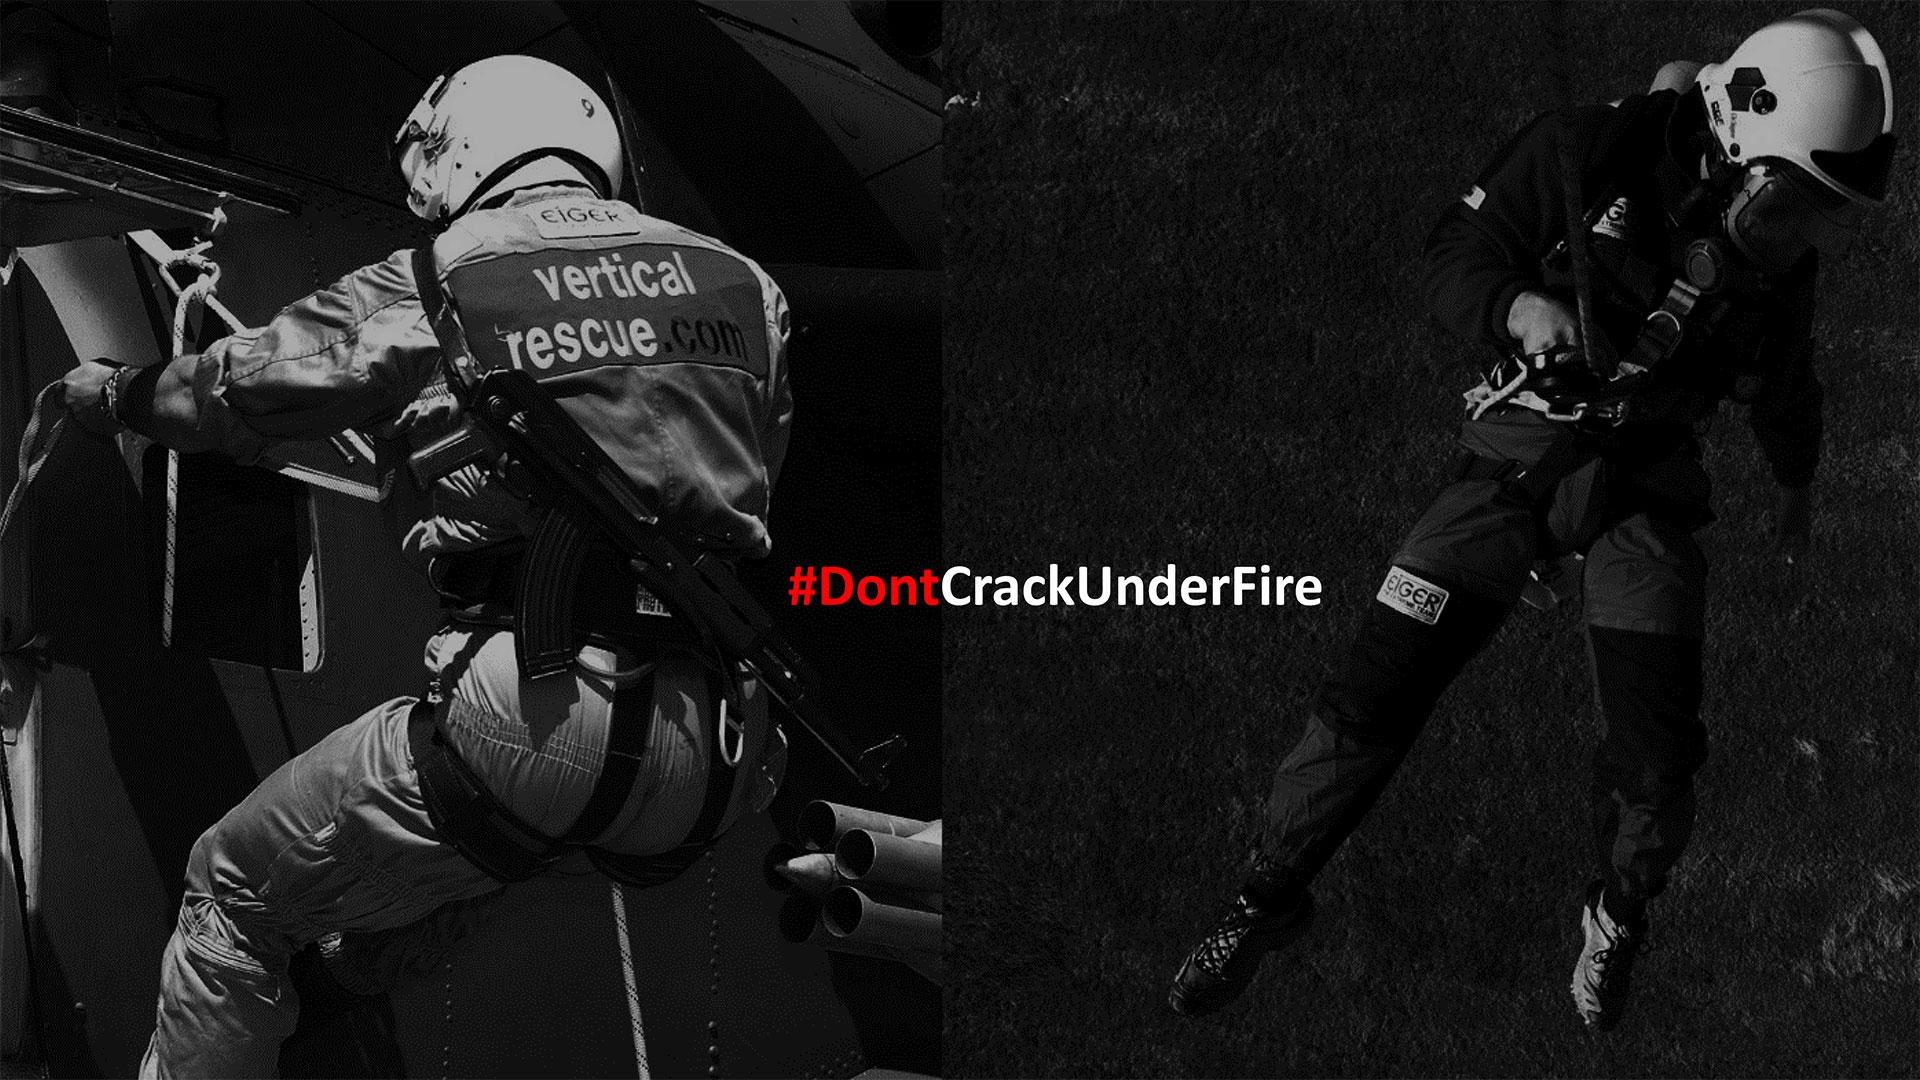 #DontCrackUnderFire